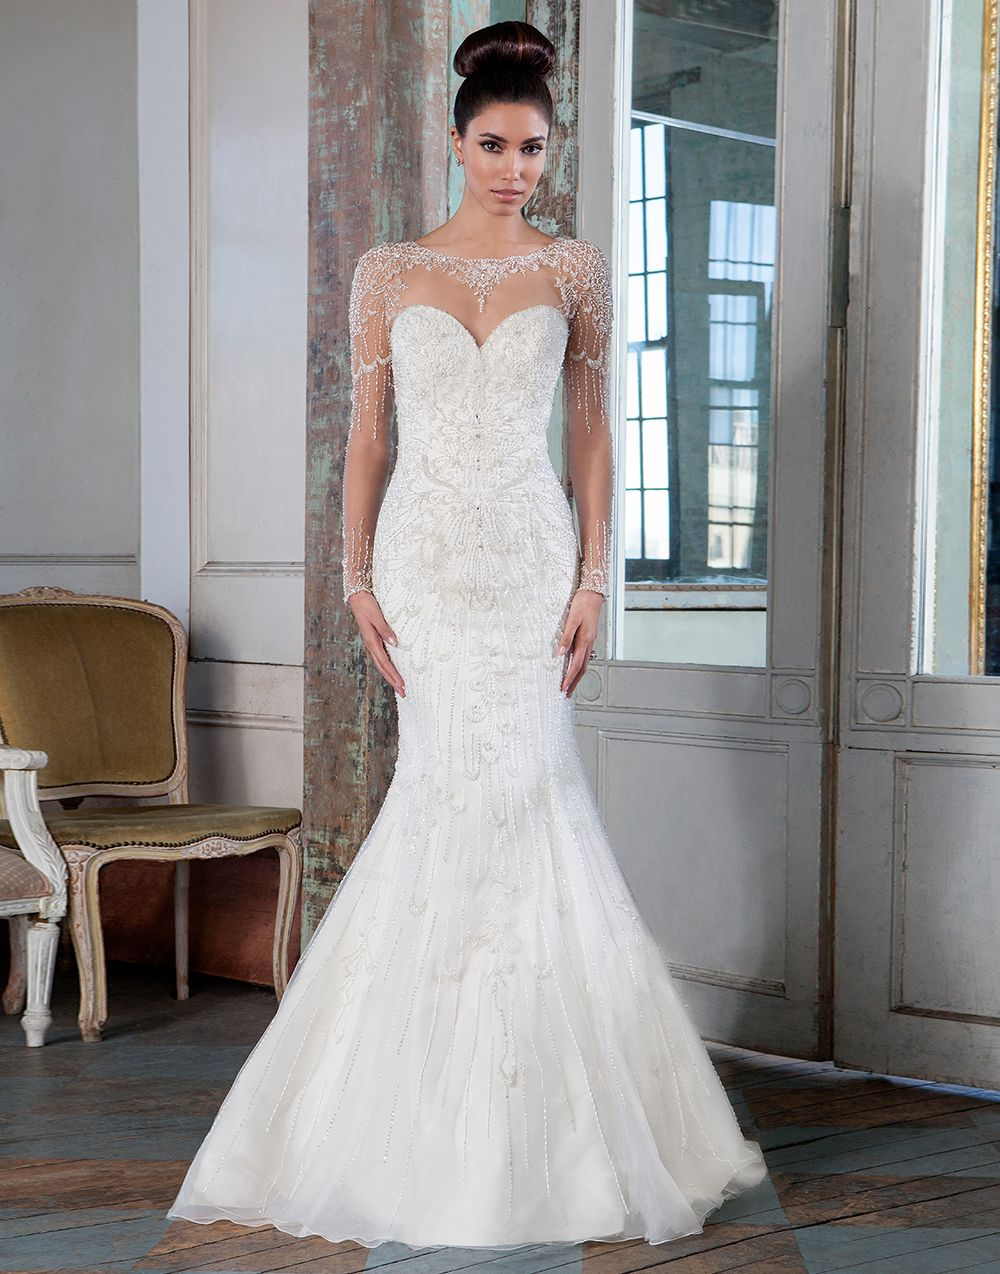 Justin Alexander signature wedding dresses style 9817   Illusions ...